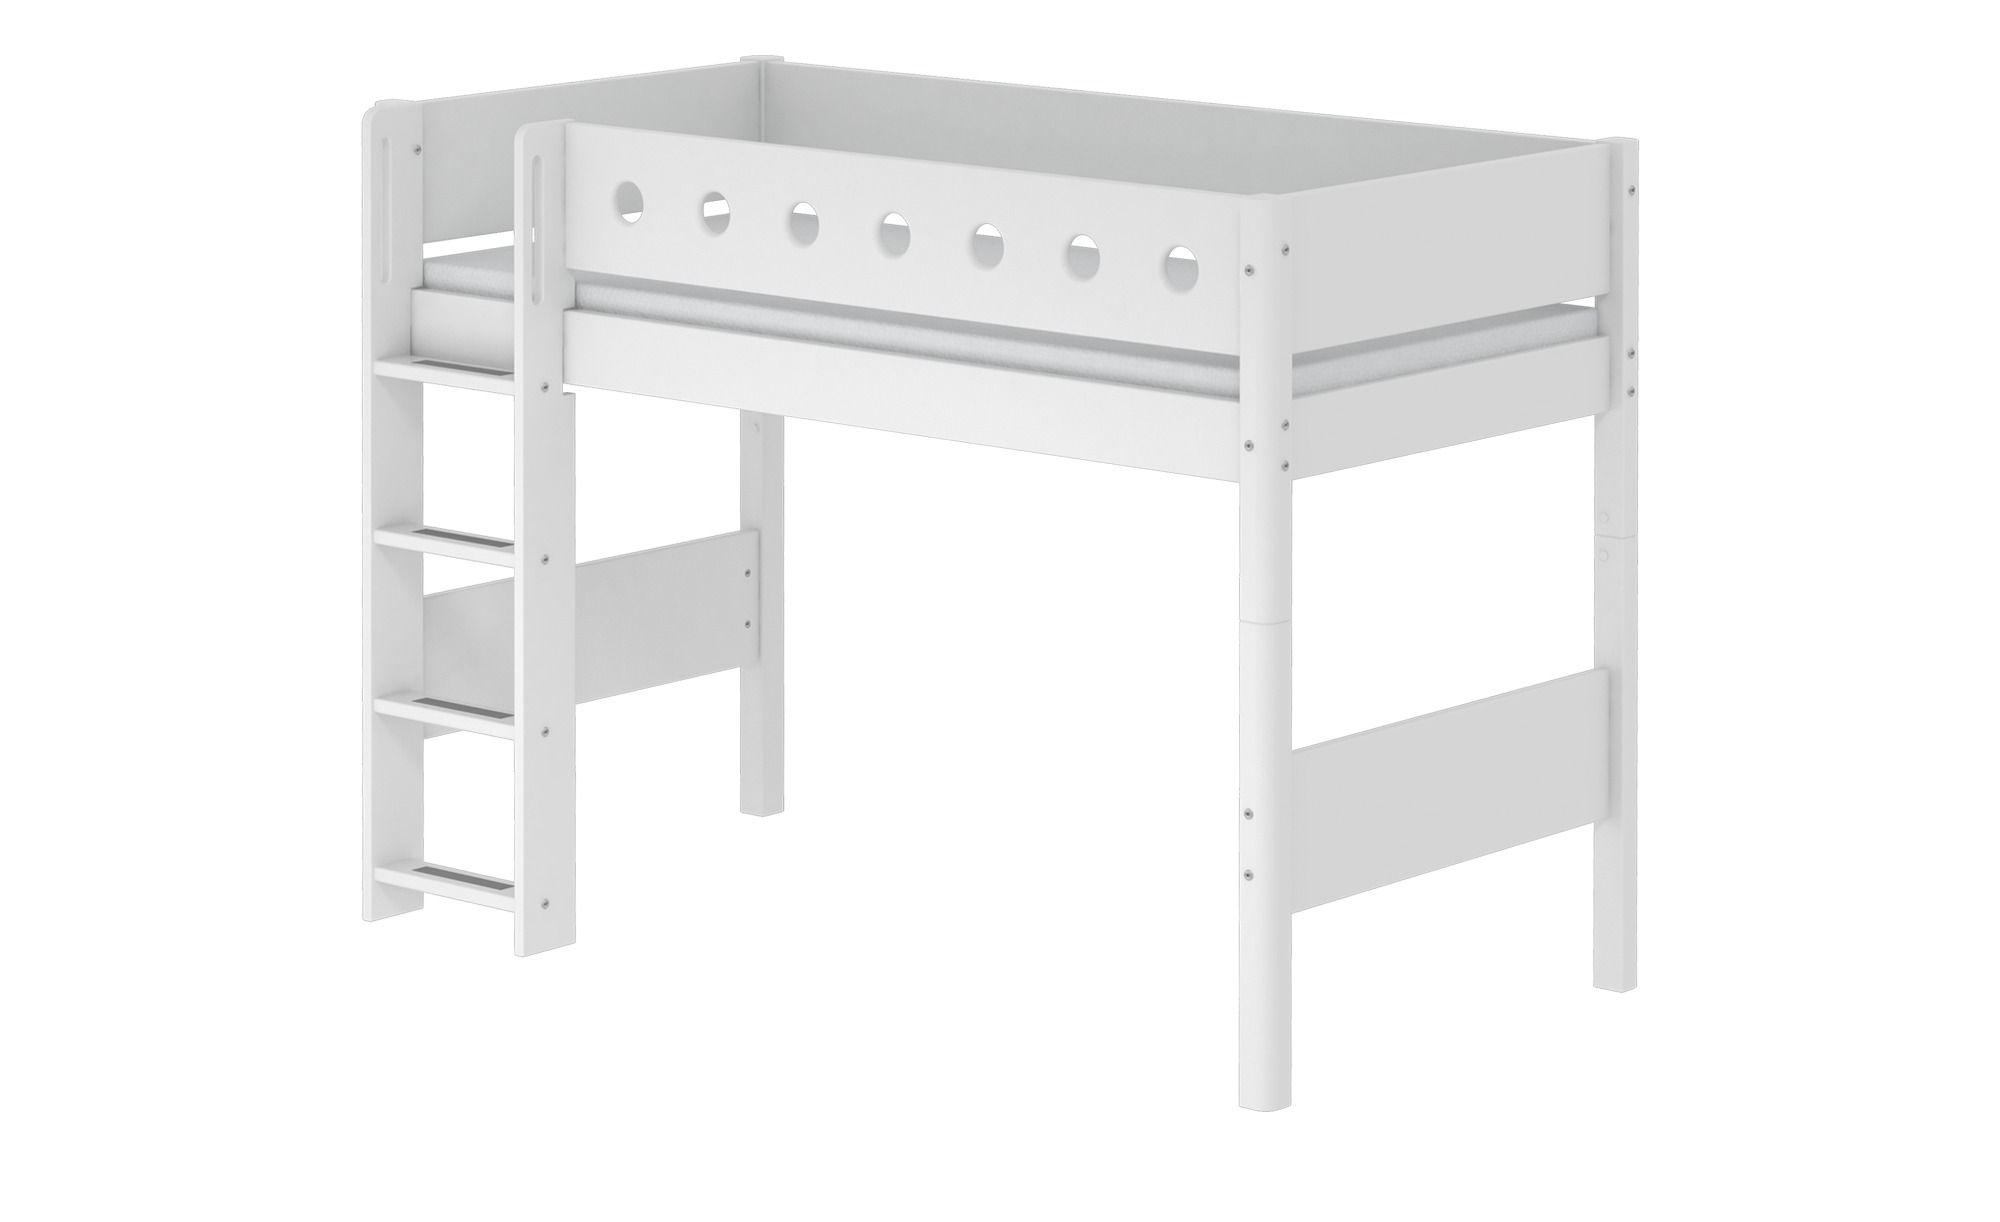 Flexa Mittelhohes Bett 90x200 Weiss Flexa White Kinder Bett Bett Ideen Und Kinderbett